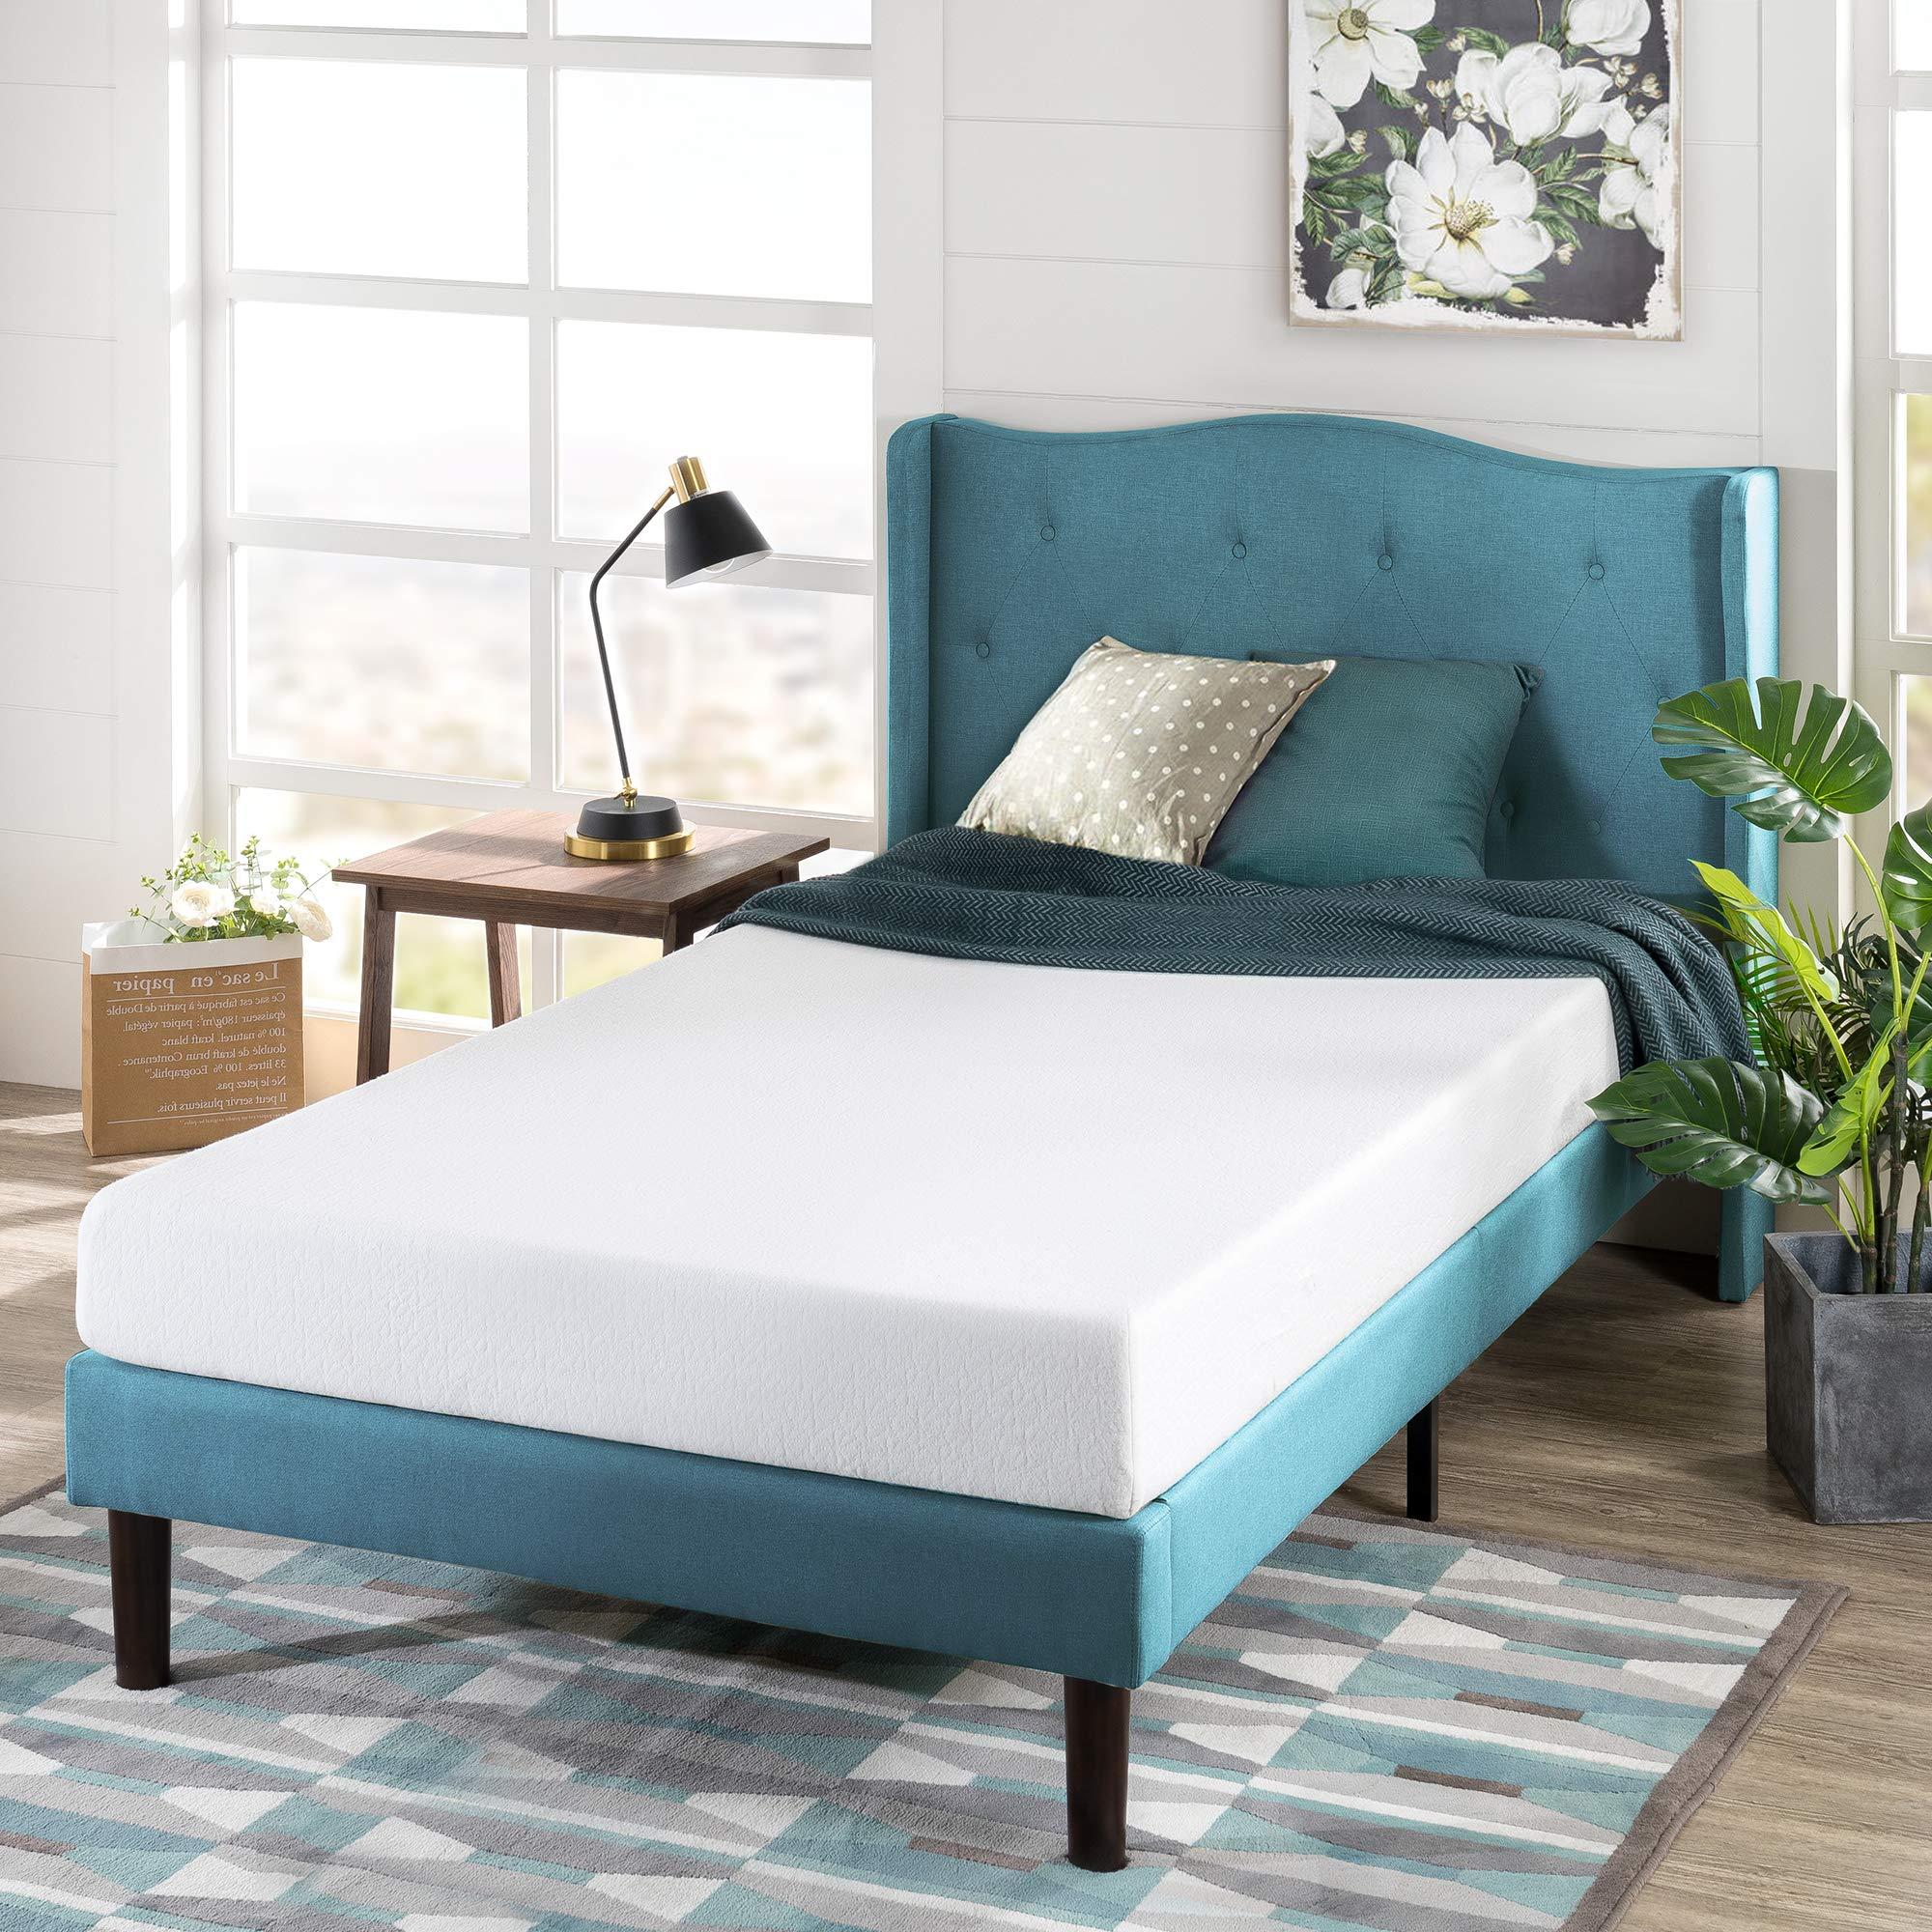 Zinus 6 Inch Green Tea Memory Foam Mattress / CertiPUR-US Certified / Bed-in-a-Box / Pressure Relieving, Narrow Twin